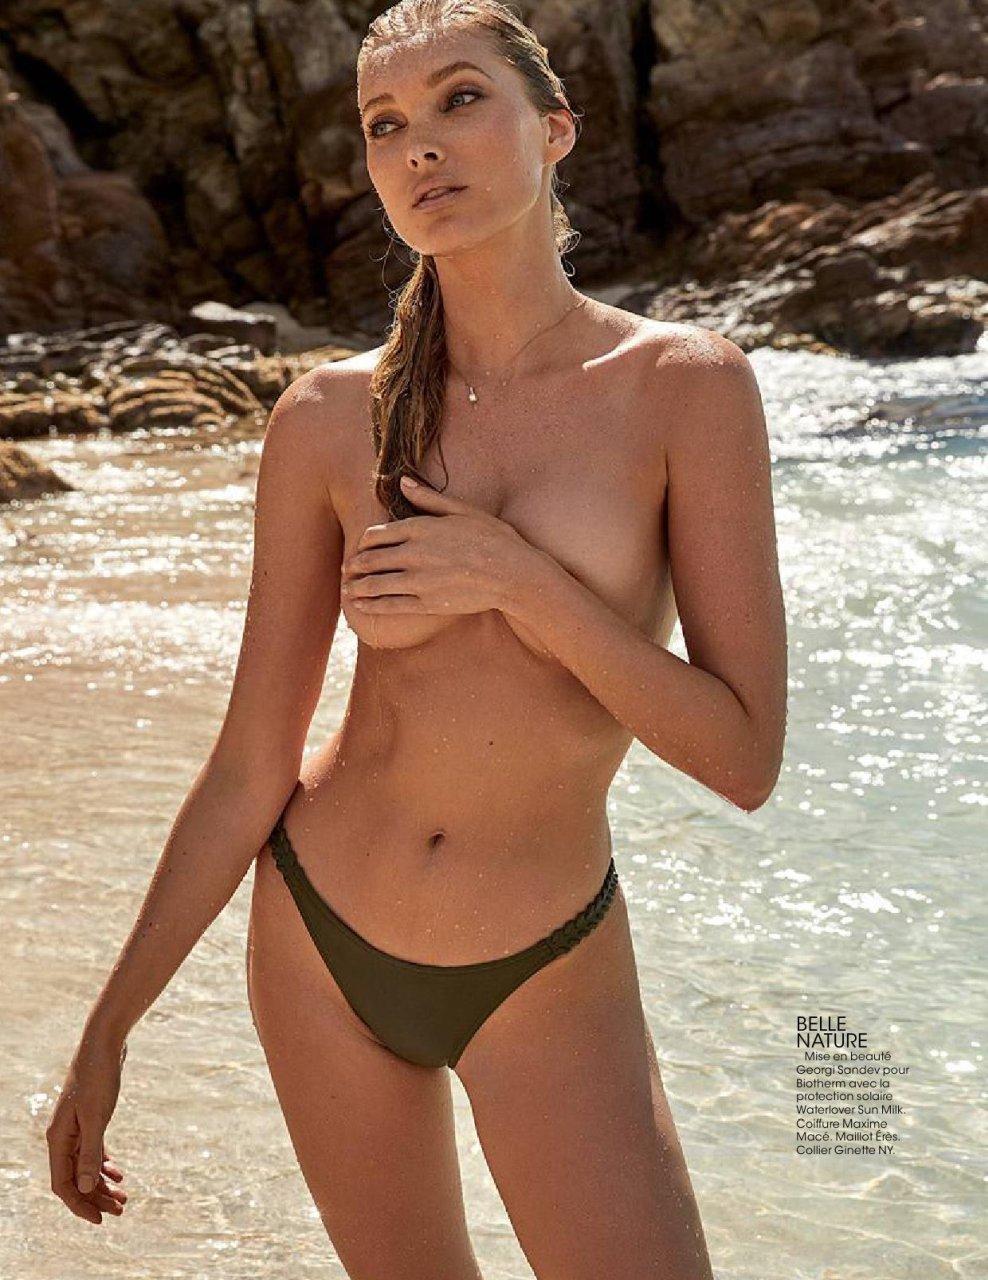 Forum on this topic: Kira Kosarin Cleavage - 7 Photos, elsa-hosk-topless-sexy-7-photos/